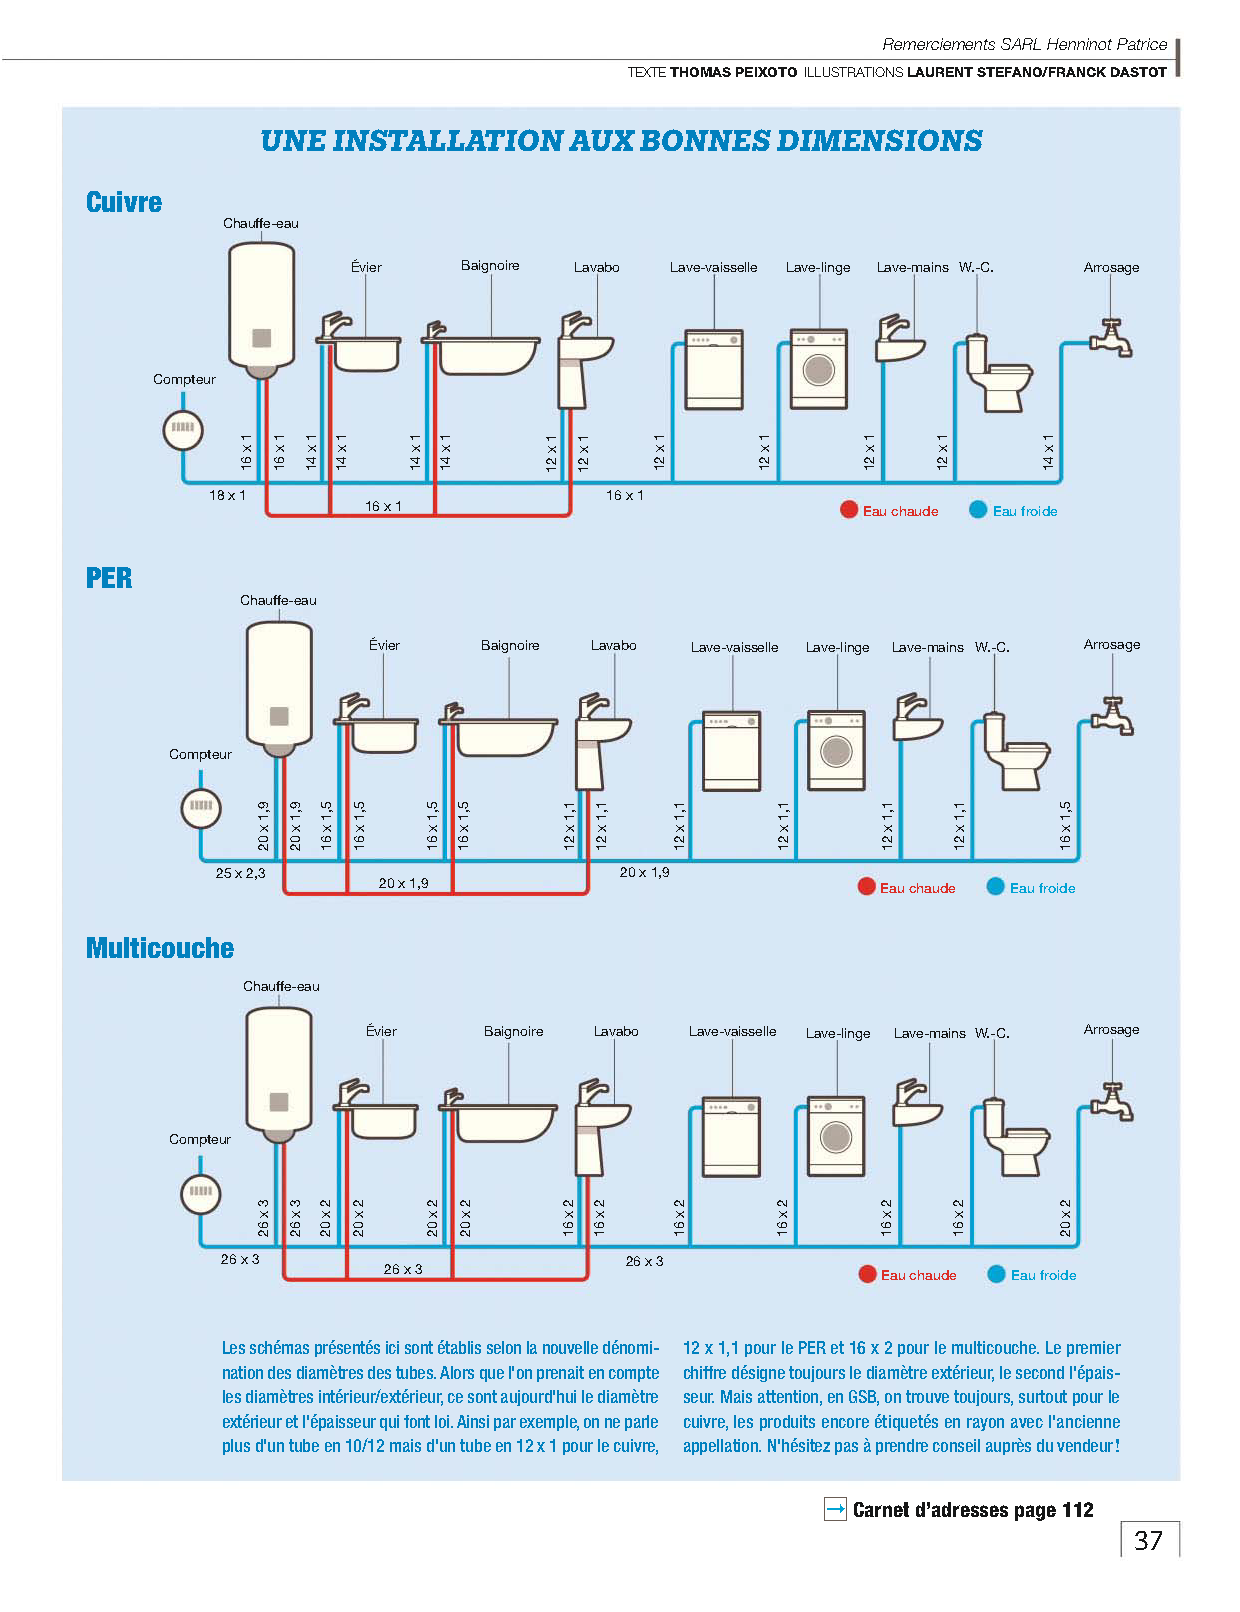 Plomberie Alimentation Installation Plomberie Plomberie Plomberie Sanitaire